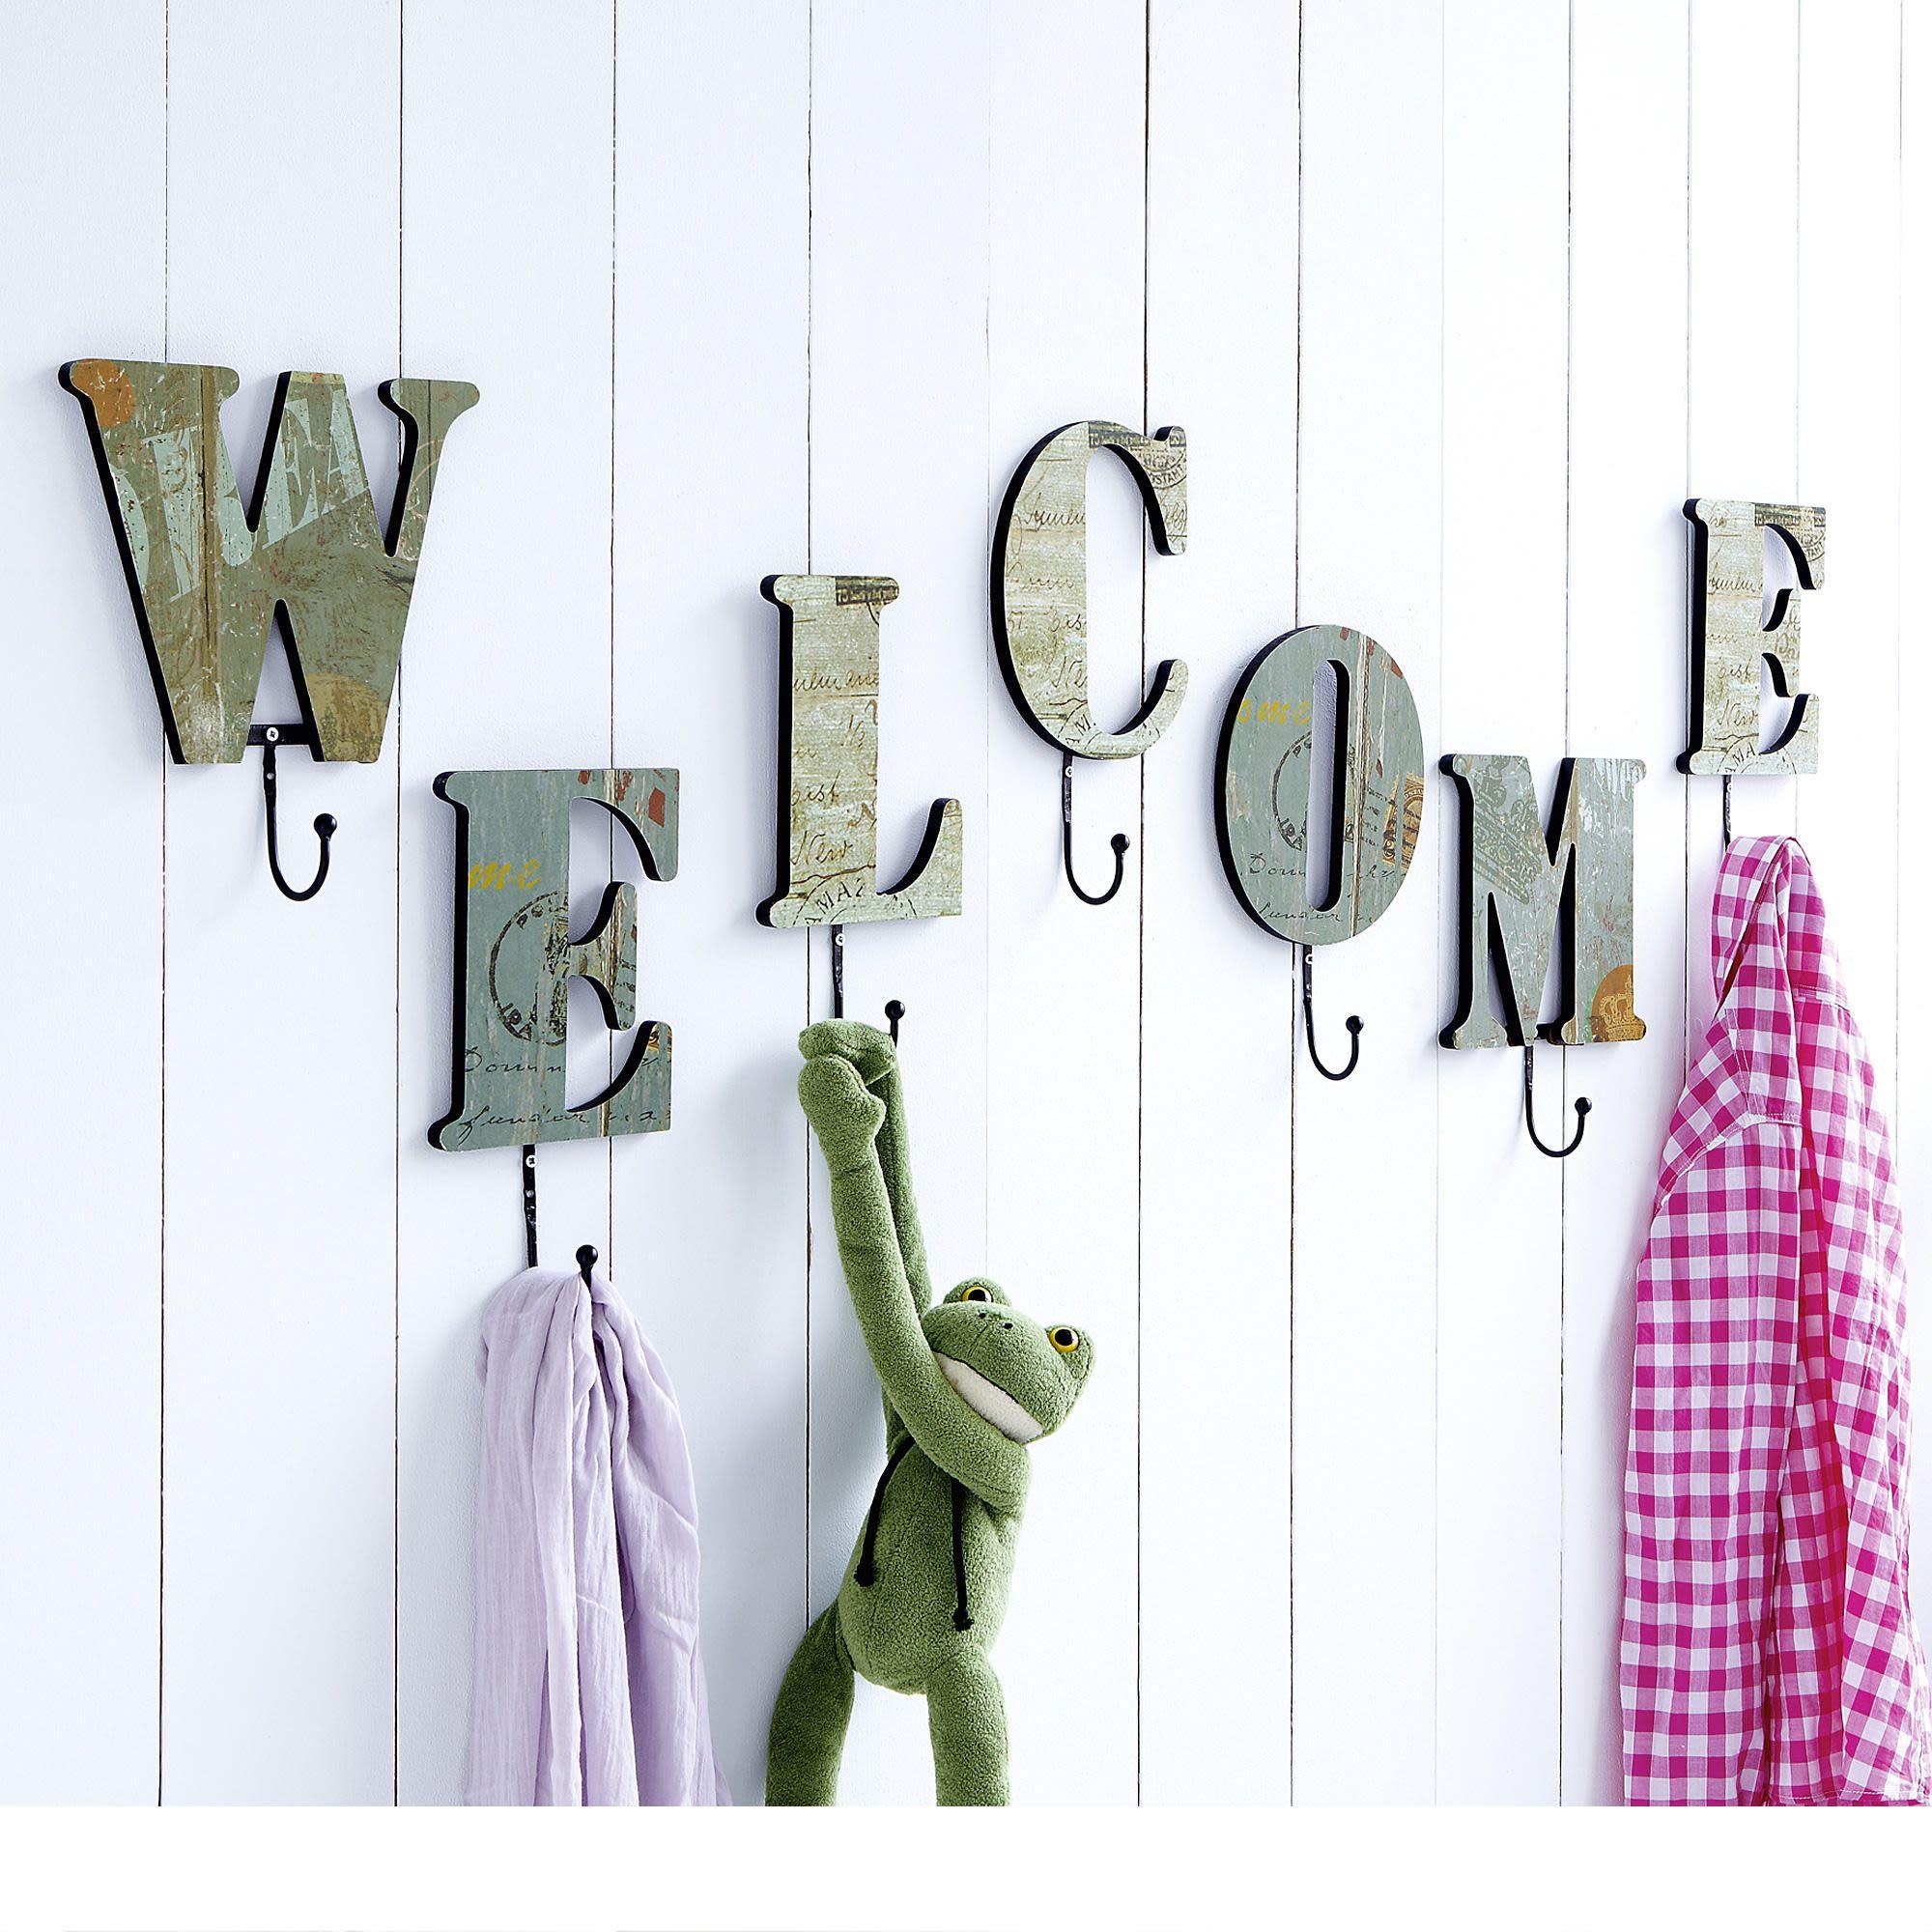 haken set welcome jackenhaken wandhaken garderobenhaken garderobe ebay. Black Bedroom Furniture Sets. Home Design Ideas